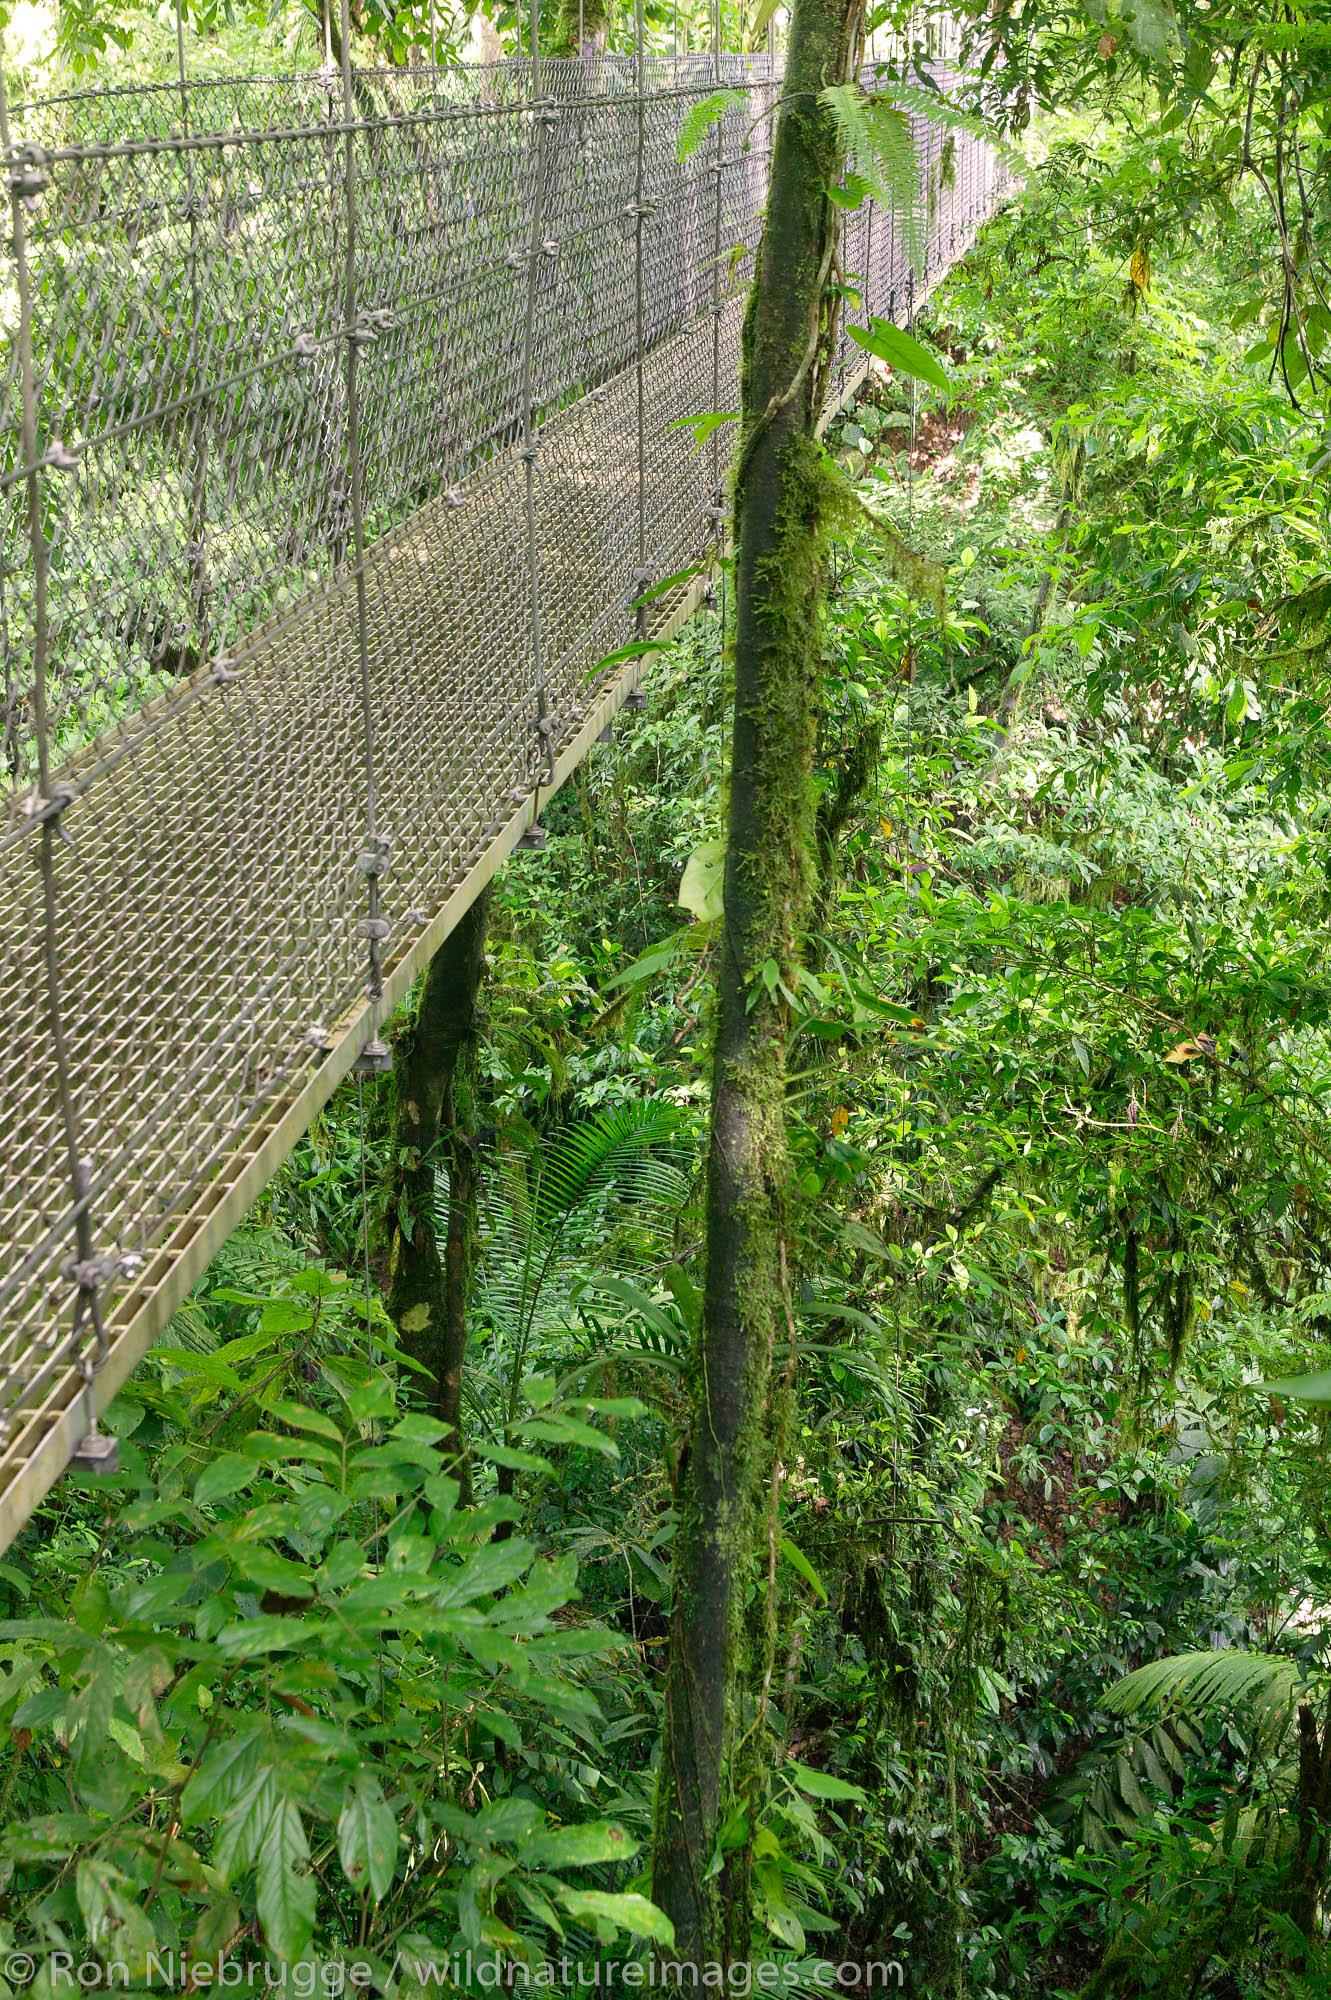 A hanging bridge on Arenal Hanging Bridges Trail, Arenal, Costa Rica.